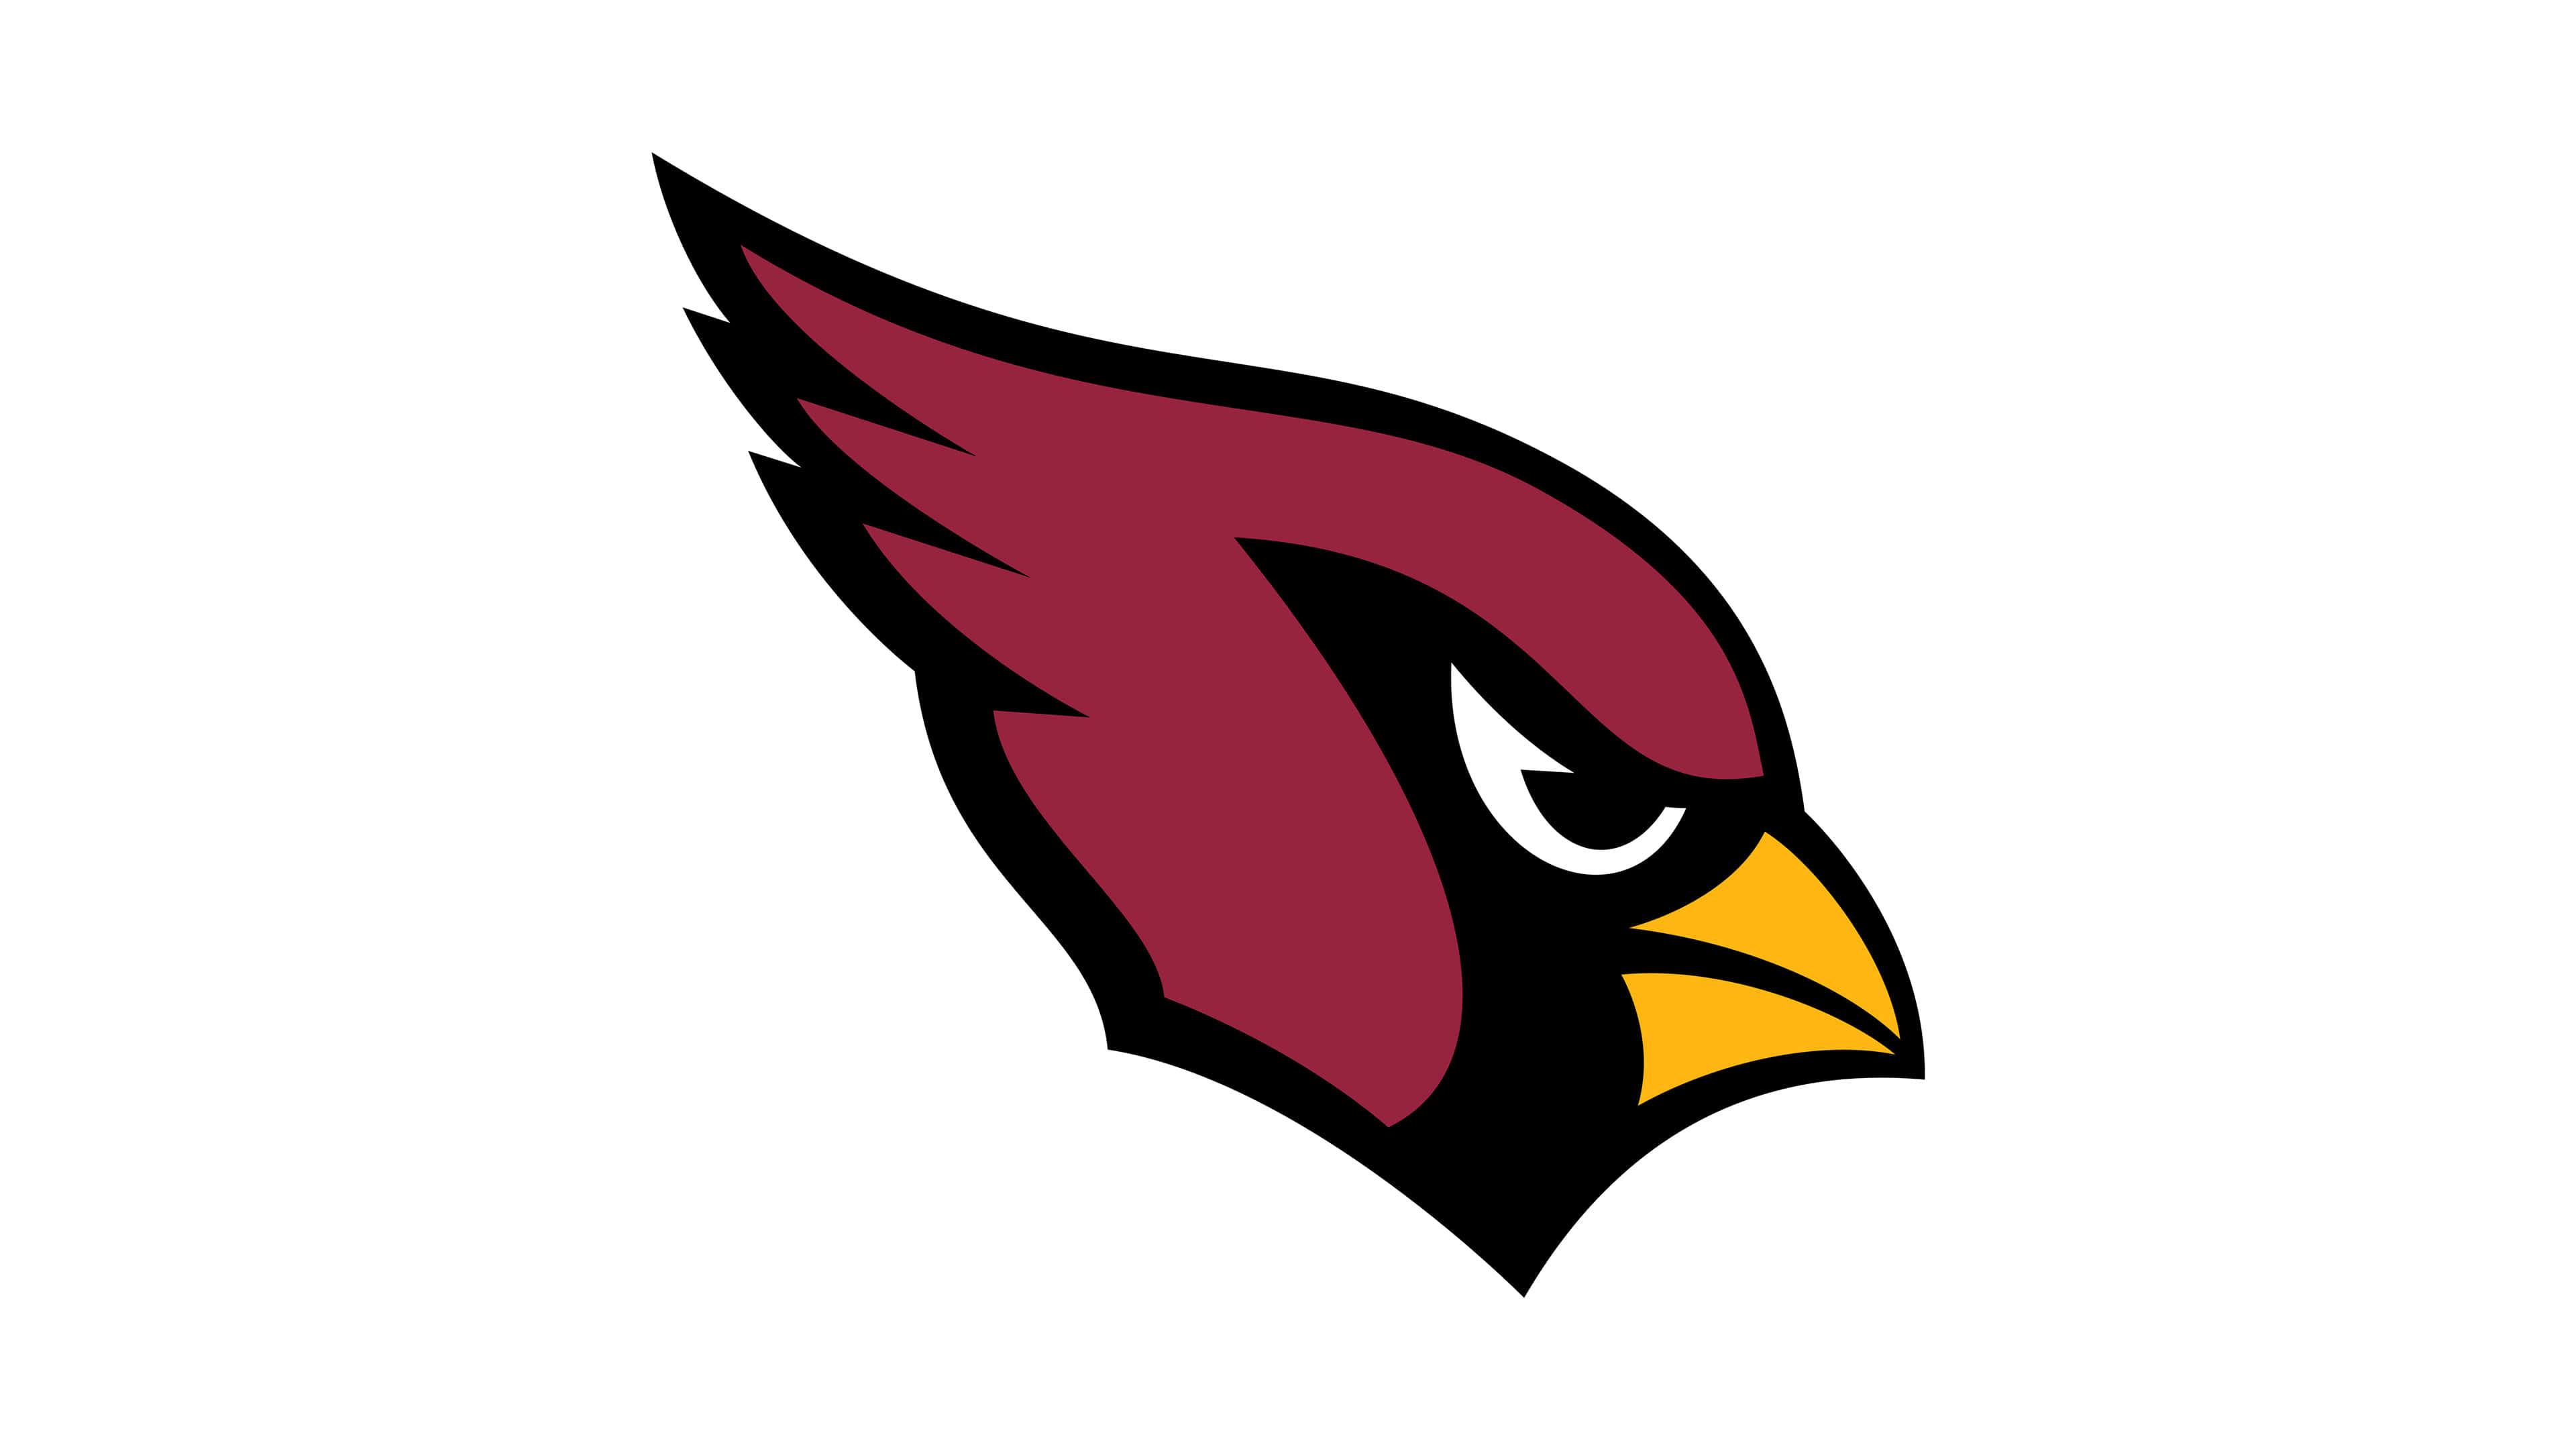 arizona cardinals nfl logo uhd 4k wallpaper